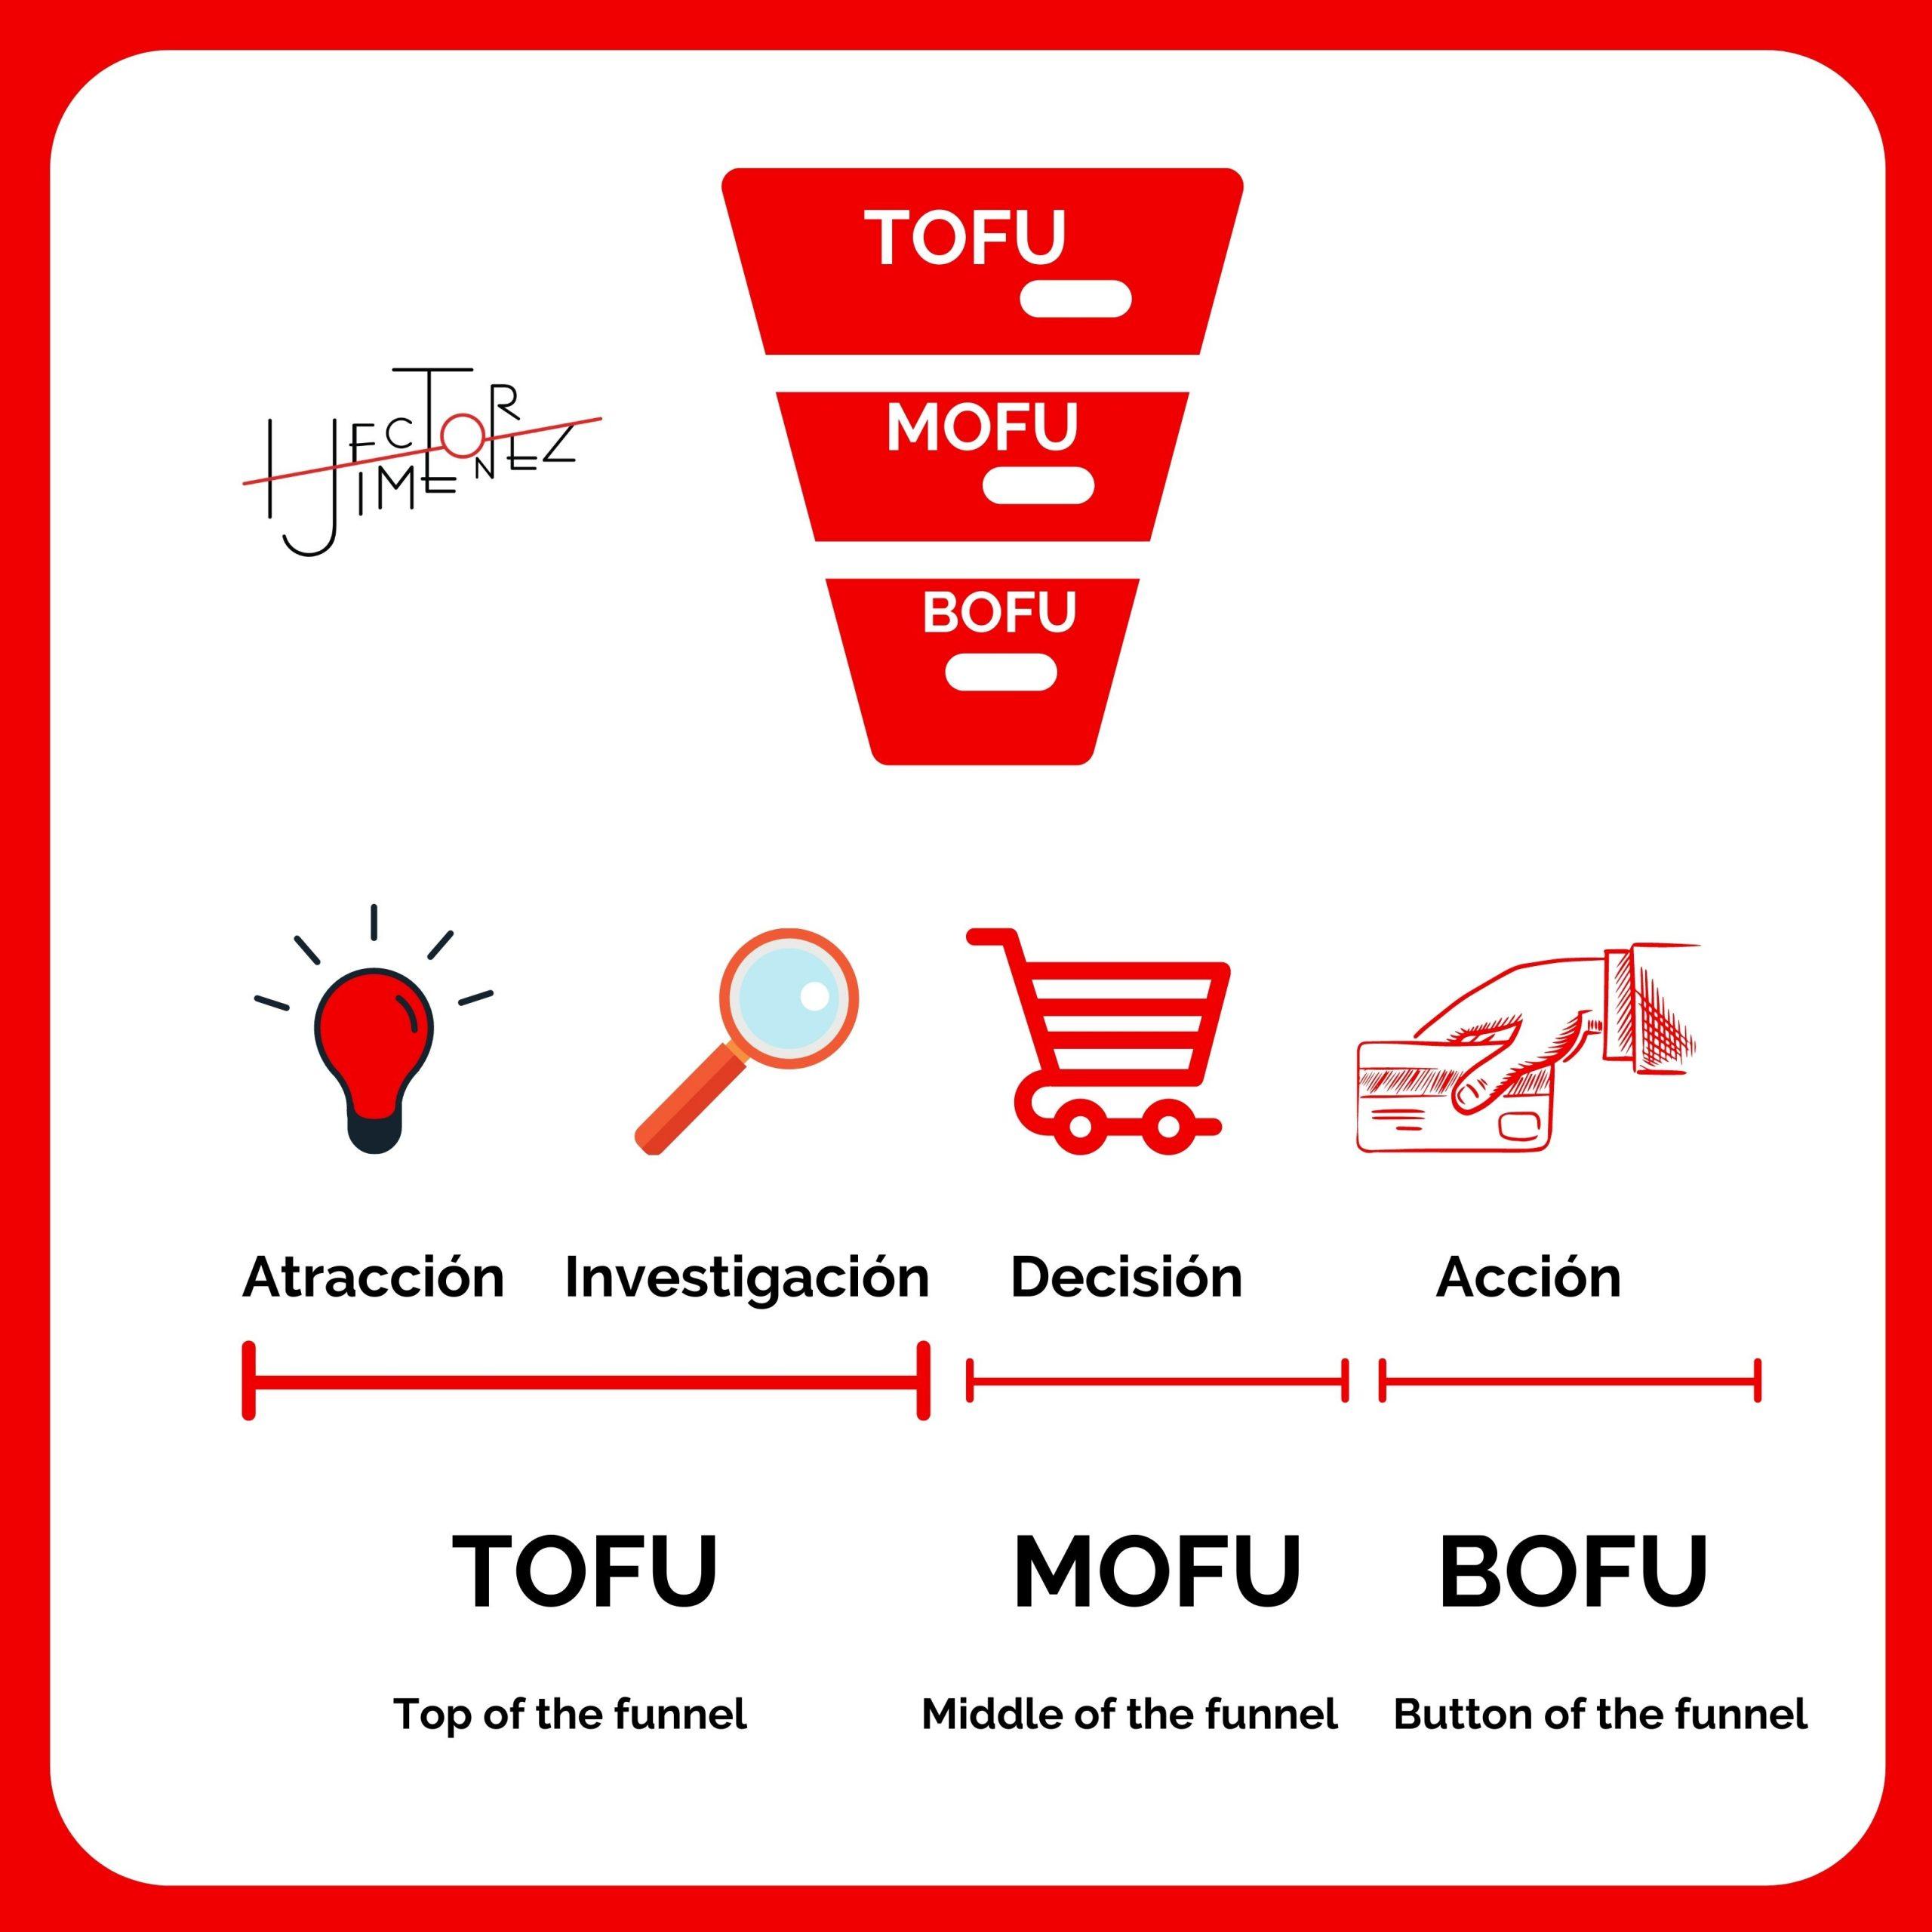 Héctor Jiménez - Vender con tu marca personal -TOFU -MOFU - BOFU